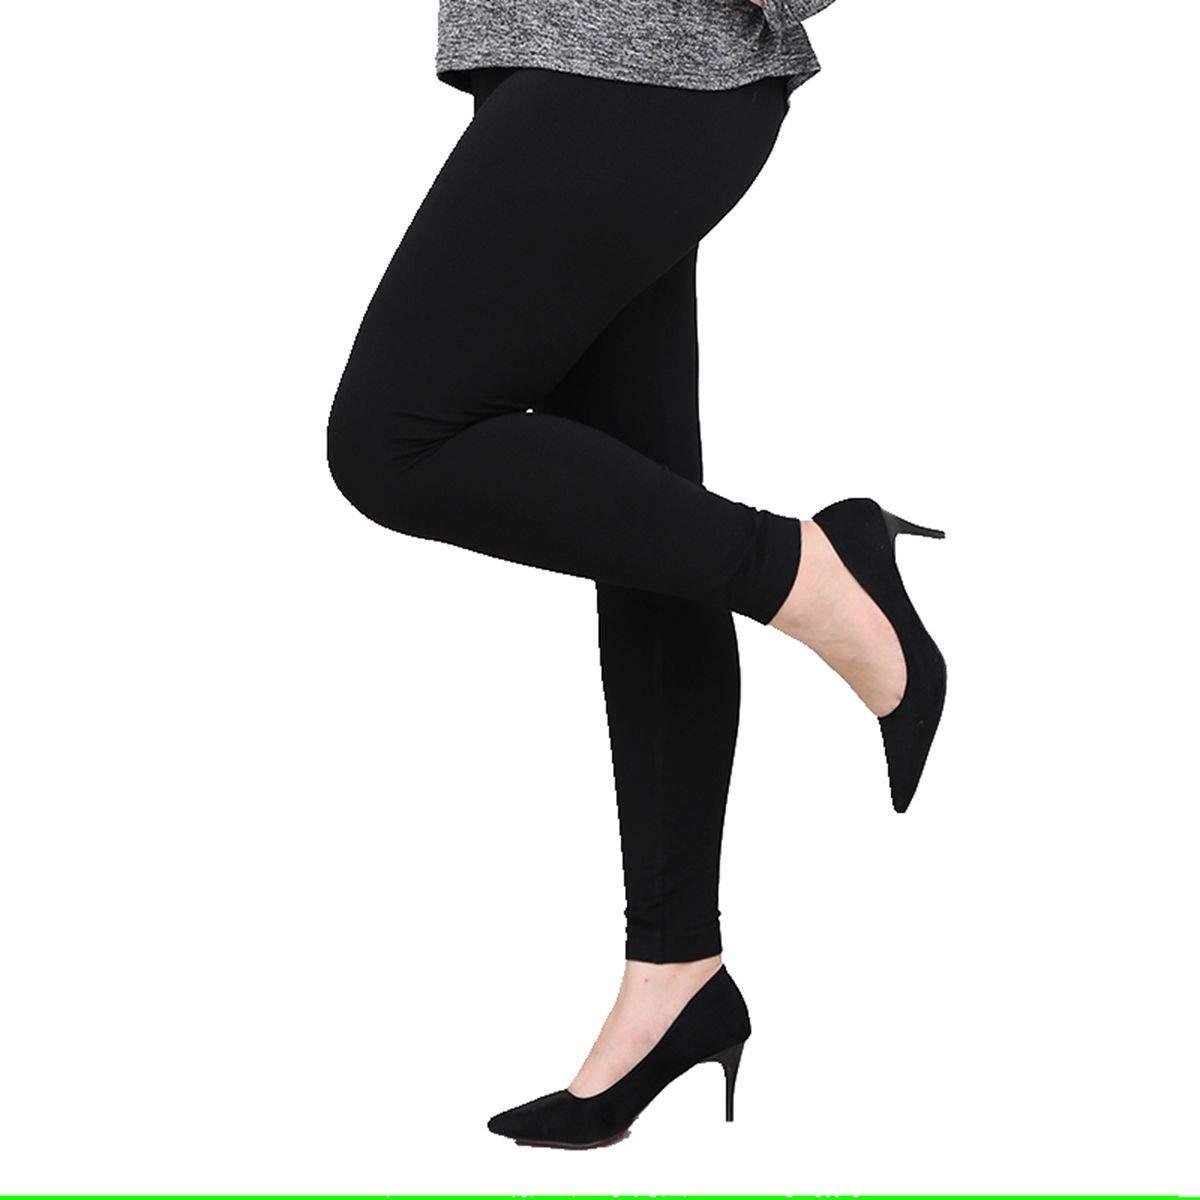 SOSUSHOE Womens Plus Size Leggings High Waist Stretch Pants Extra Soft Ankle Length, Black